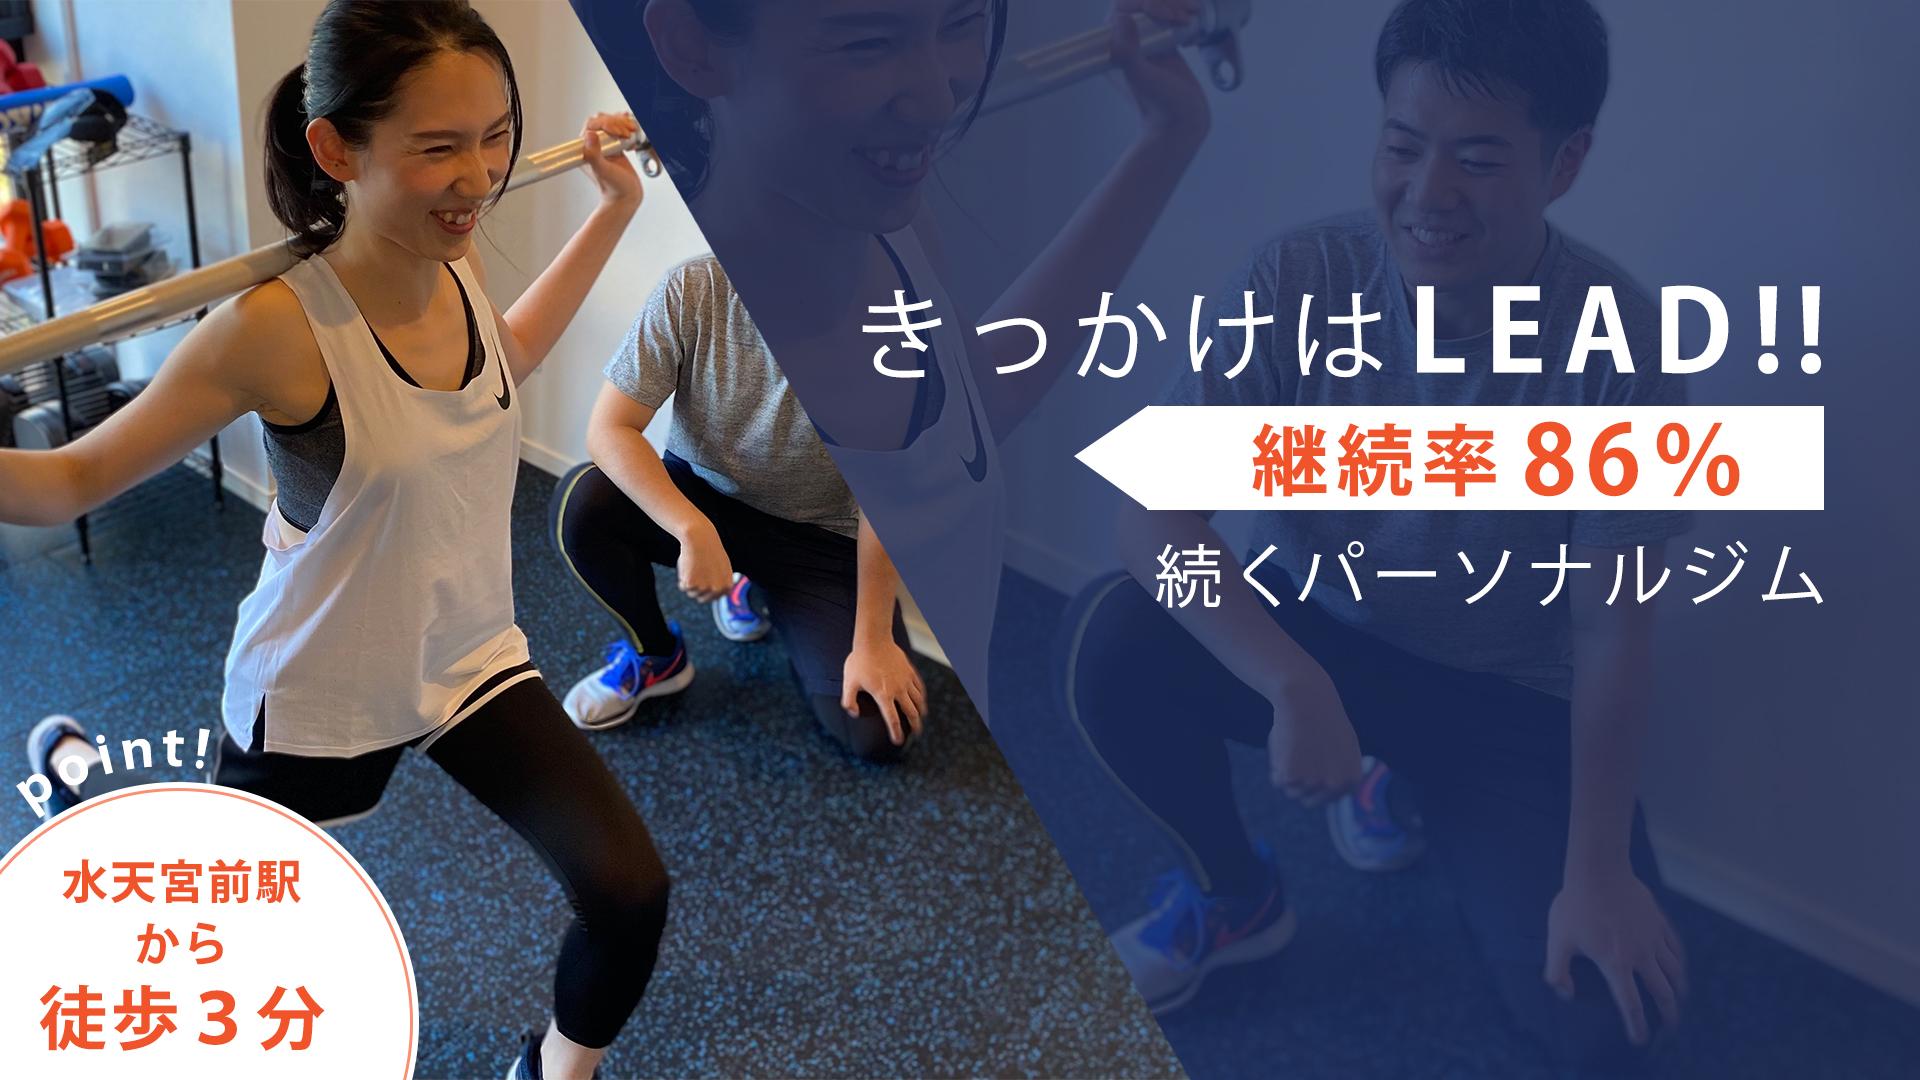 Personal Training Gym LEAD